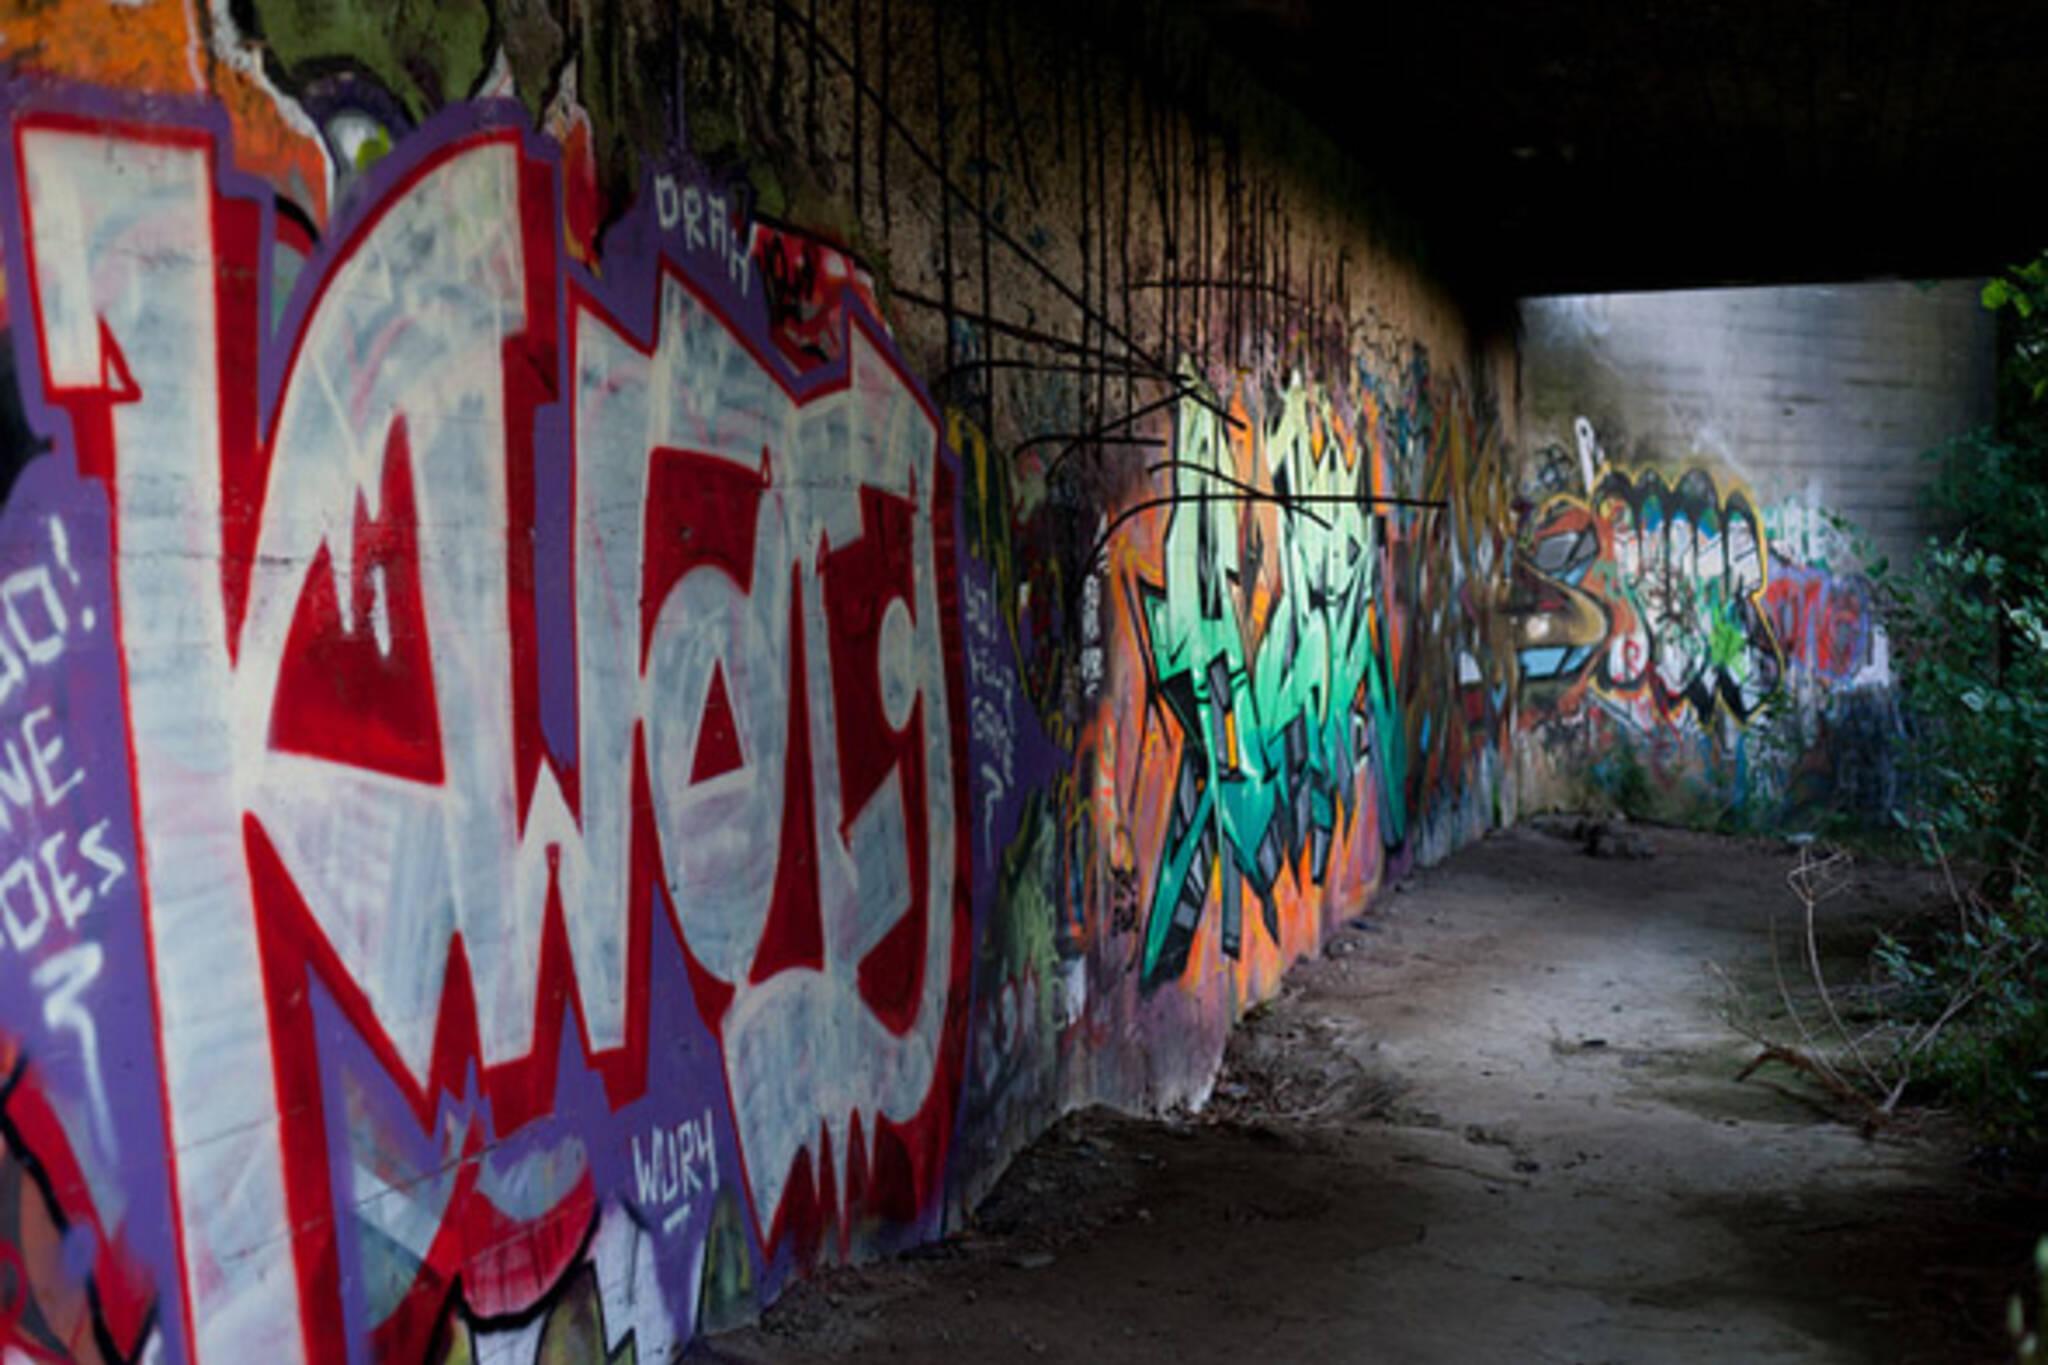 graffiti, alley, night